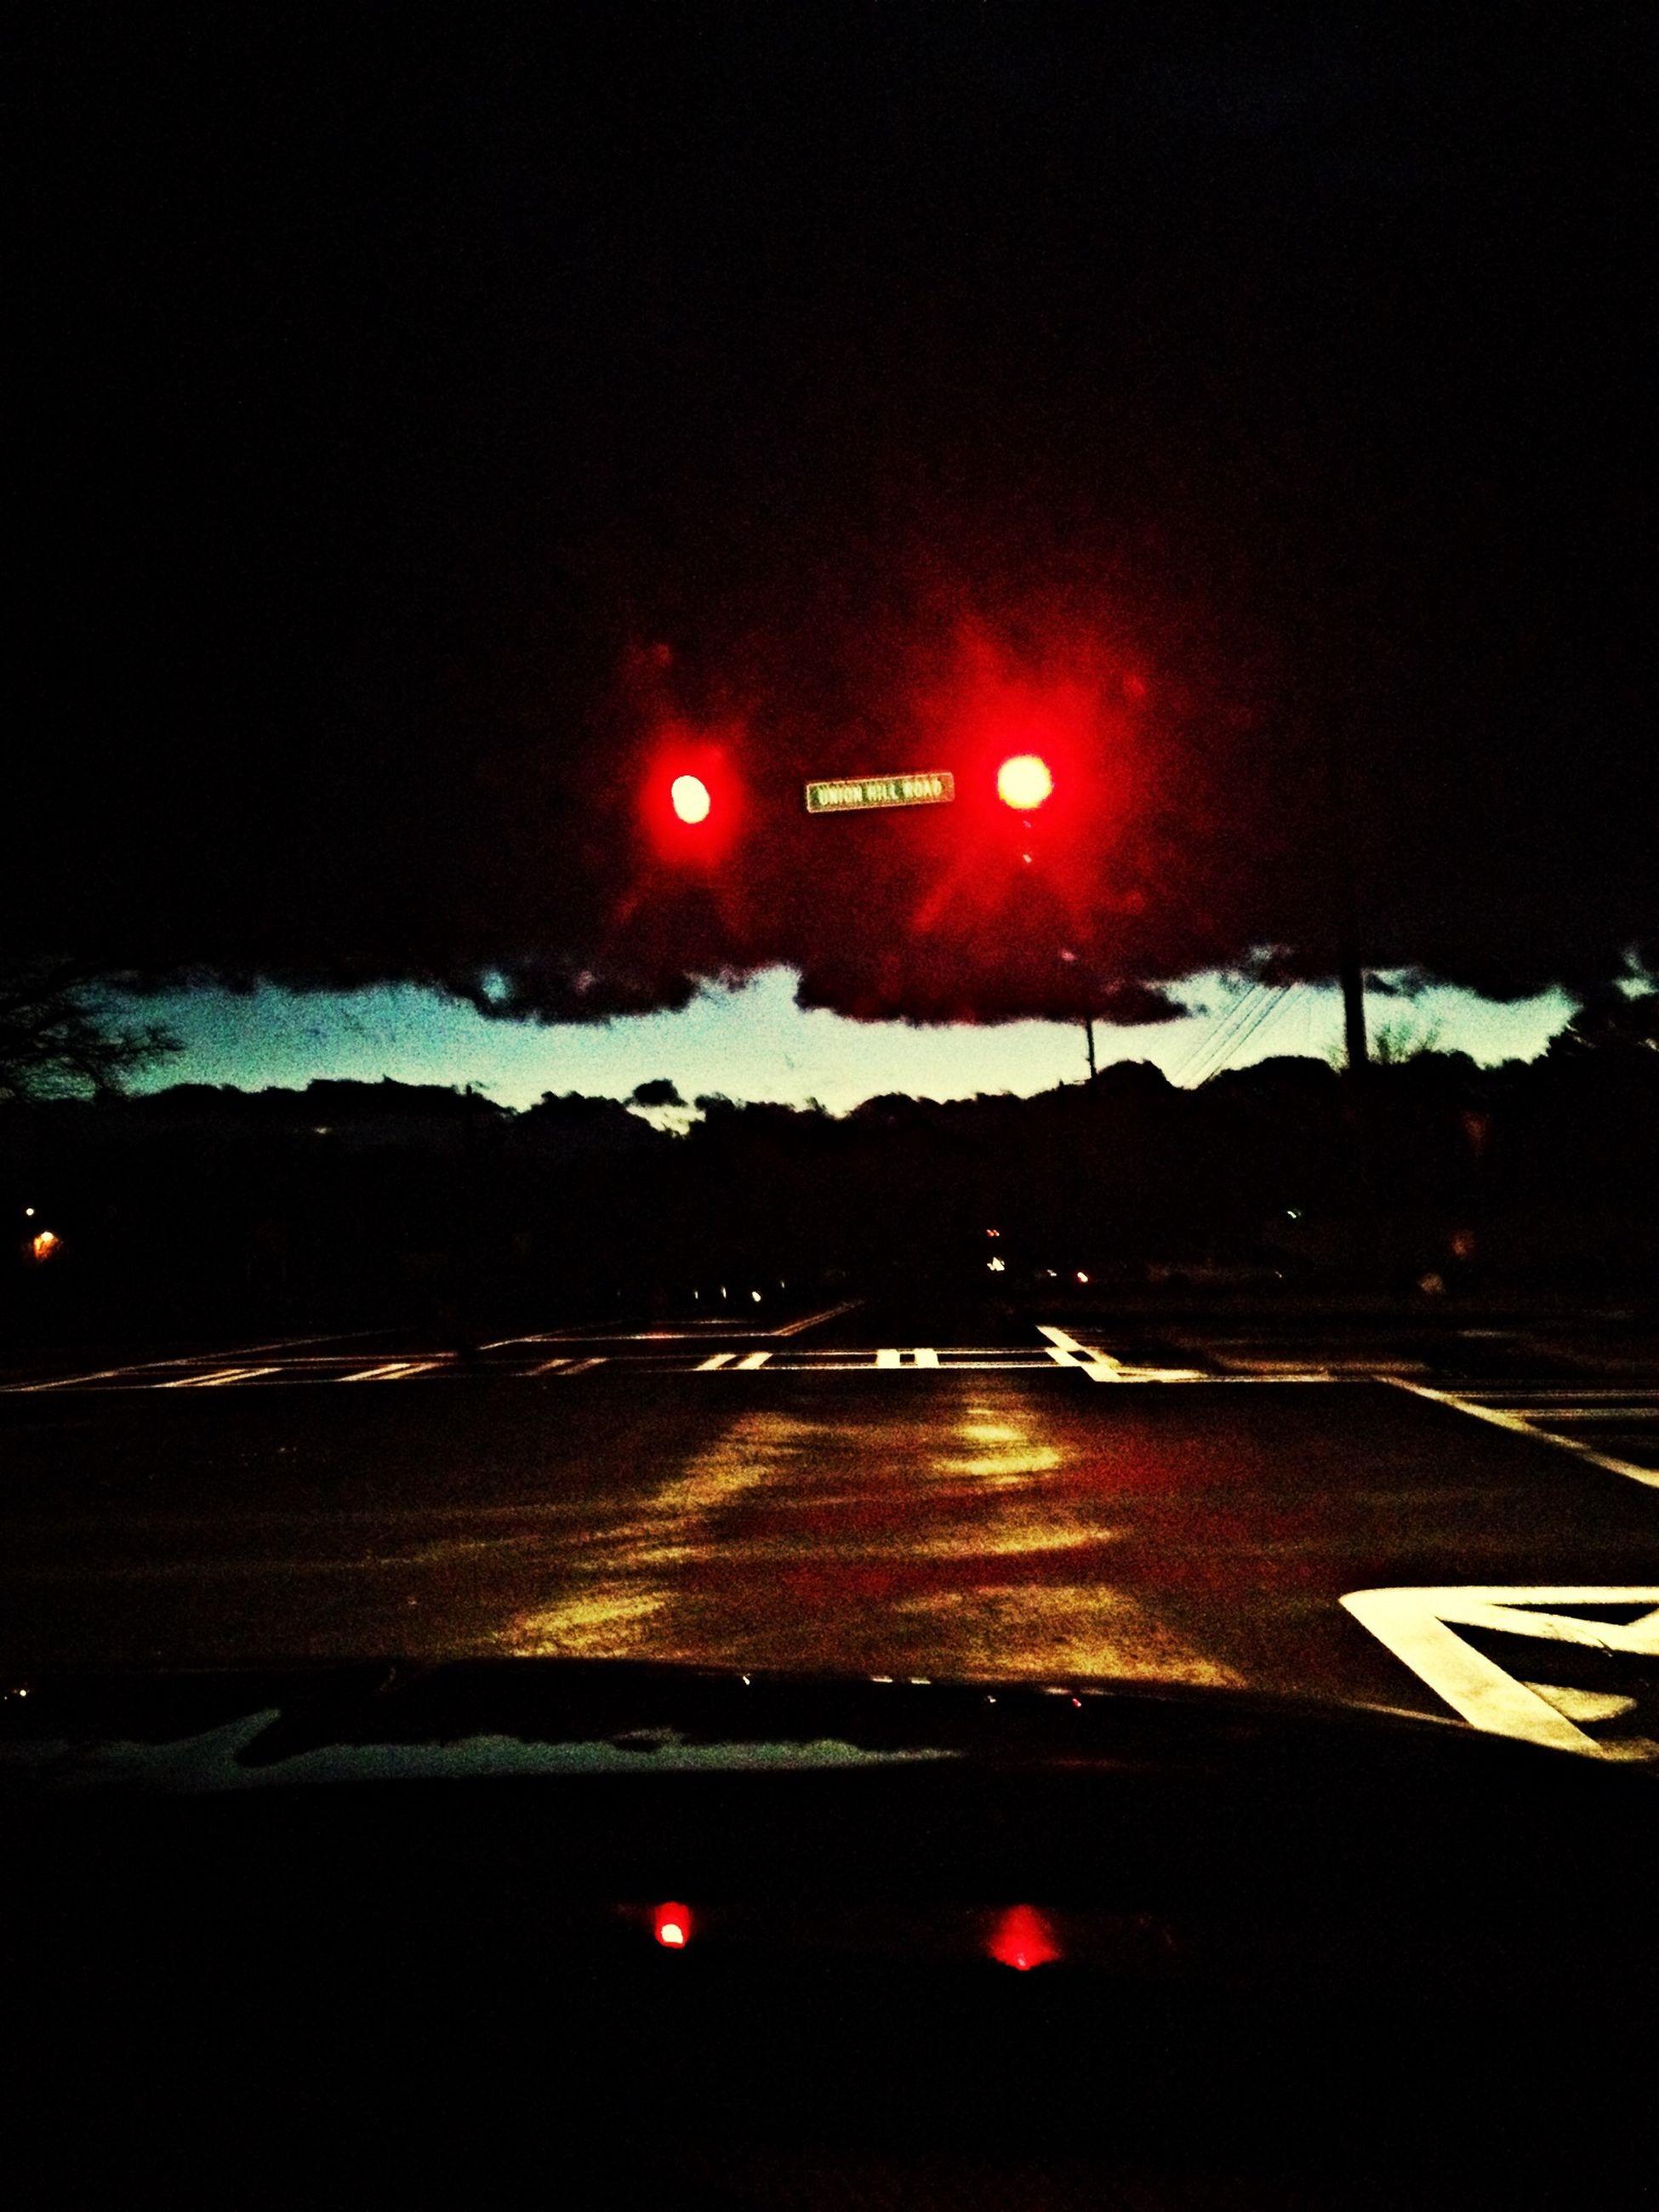 illuminated, transportation, night, red, sky, sunset, road, car, street, sun, lens flare, street light, mode of transport, road sign, no people, outdoors, land vehicle, scenics, dusk, lighting equipment